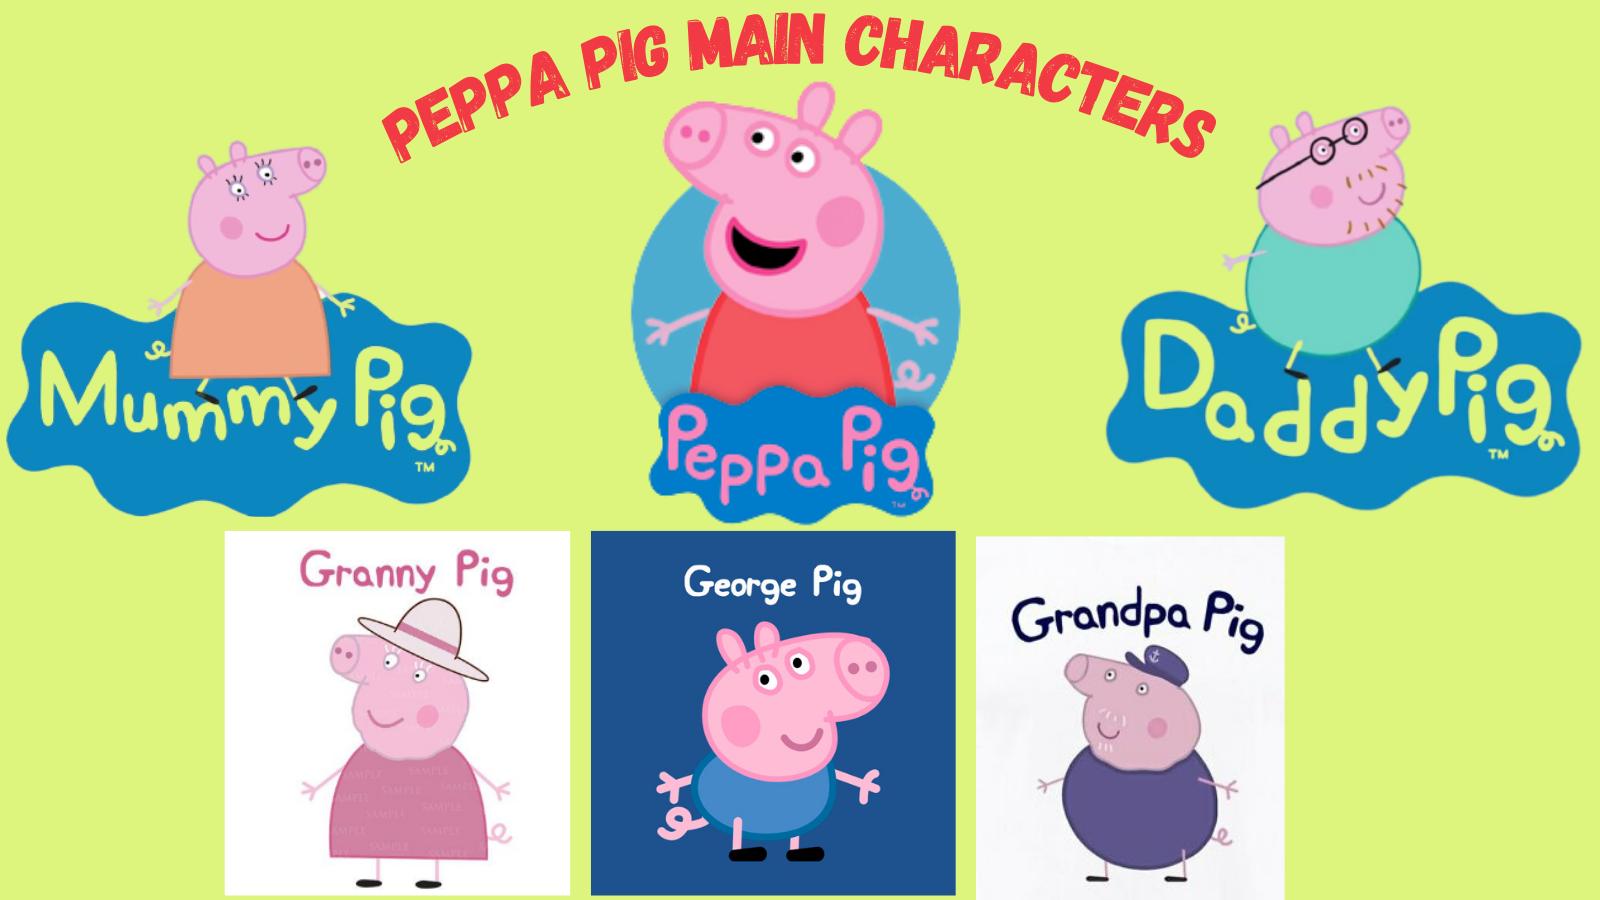 Peppa Pig Main Characters.